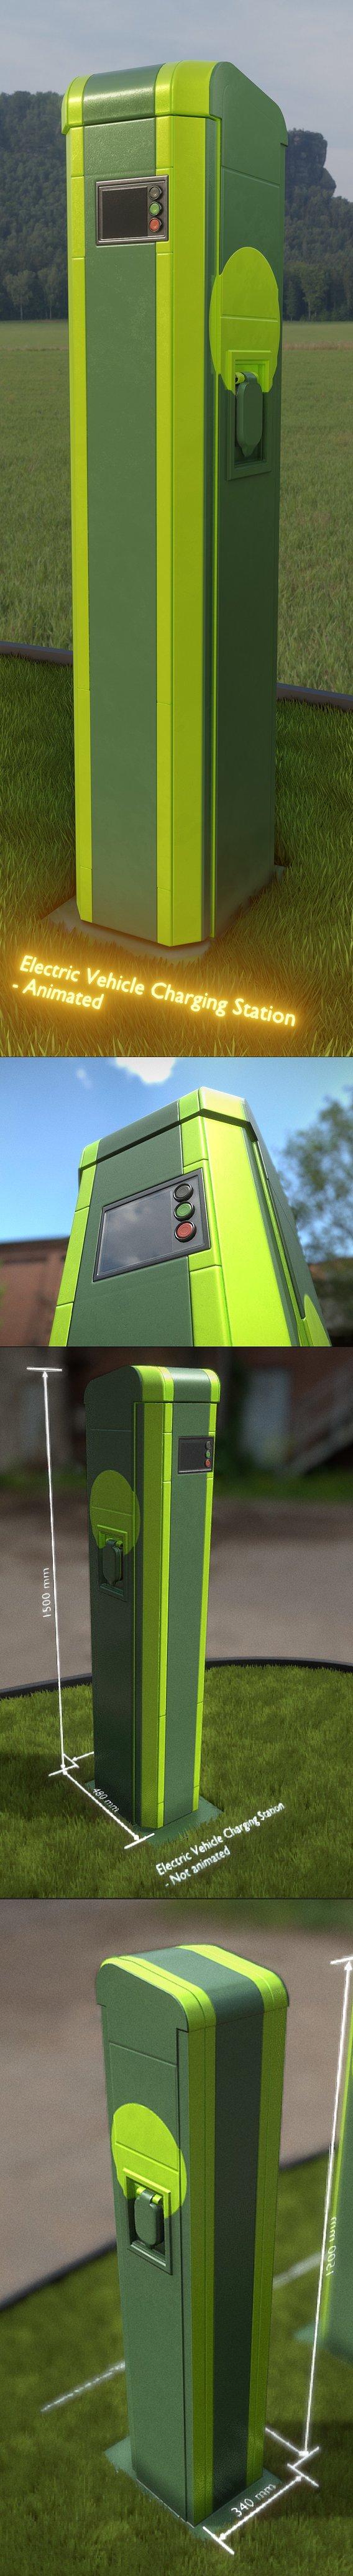 Electric Vehicle Charging Station 2 (Normal Version) (Blender-2.92 Eevee)